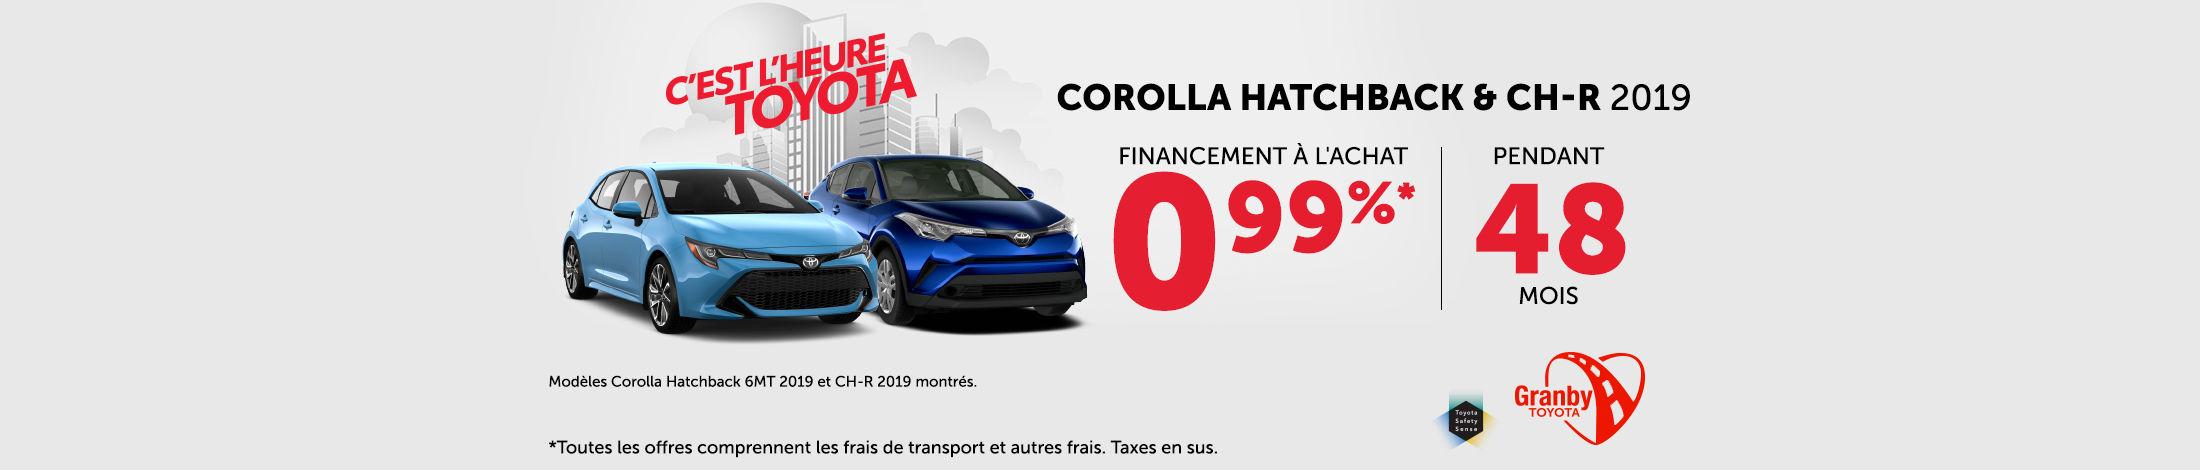 Corolla S hatchback & C-HR  2019